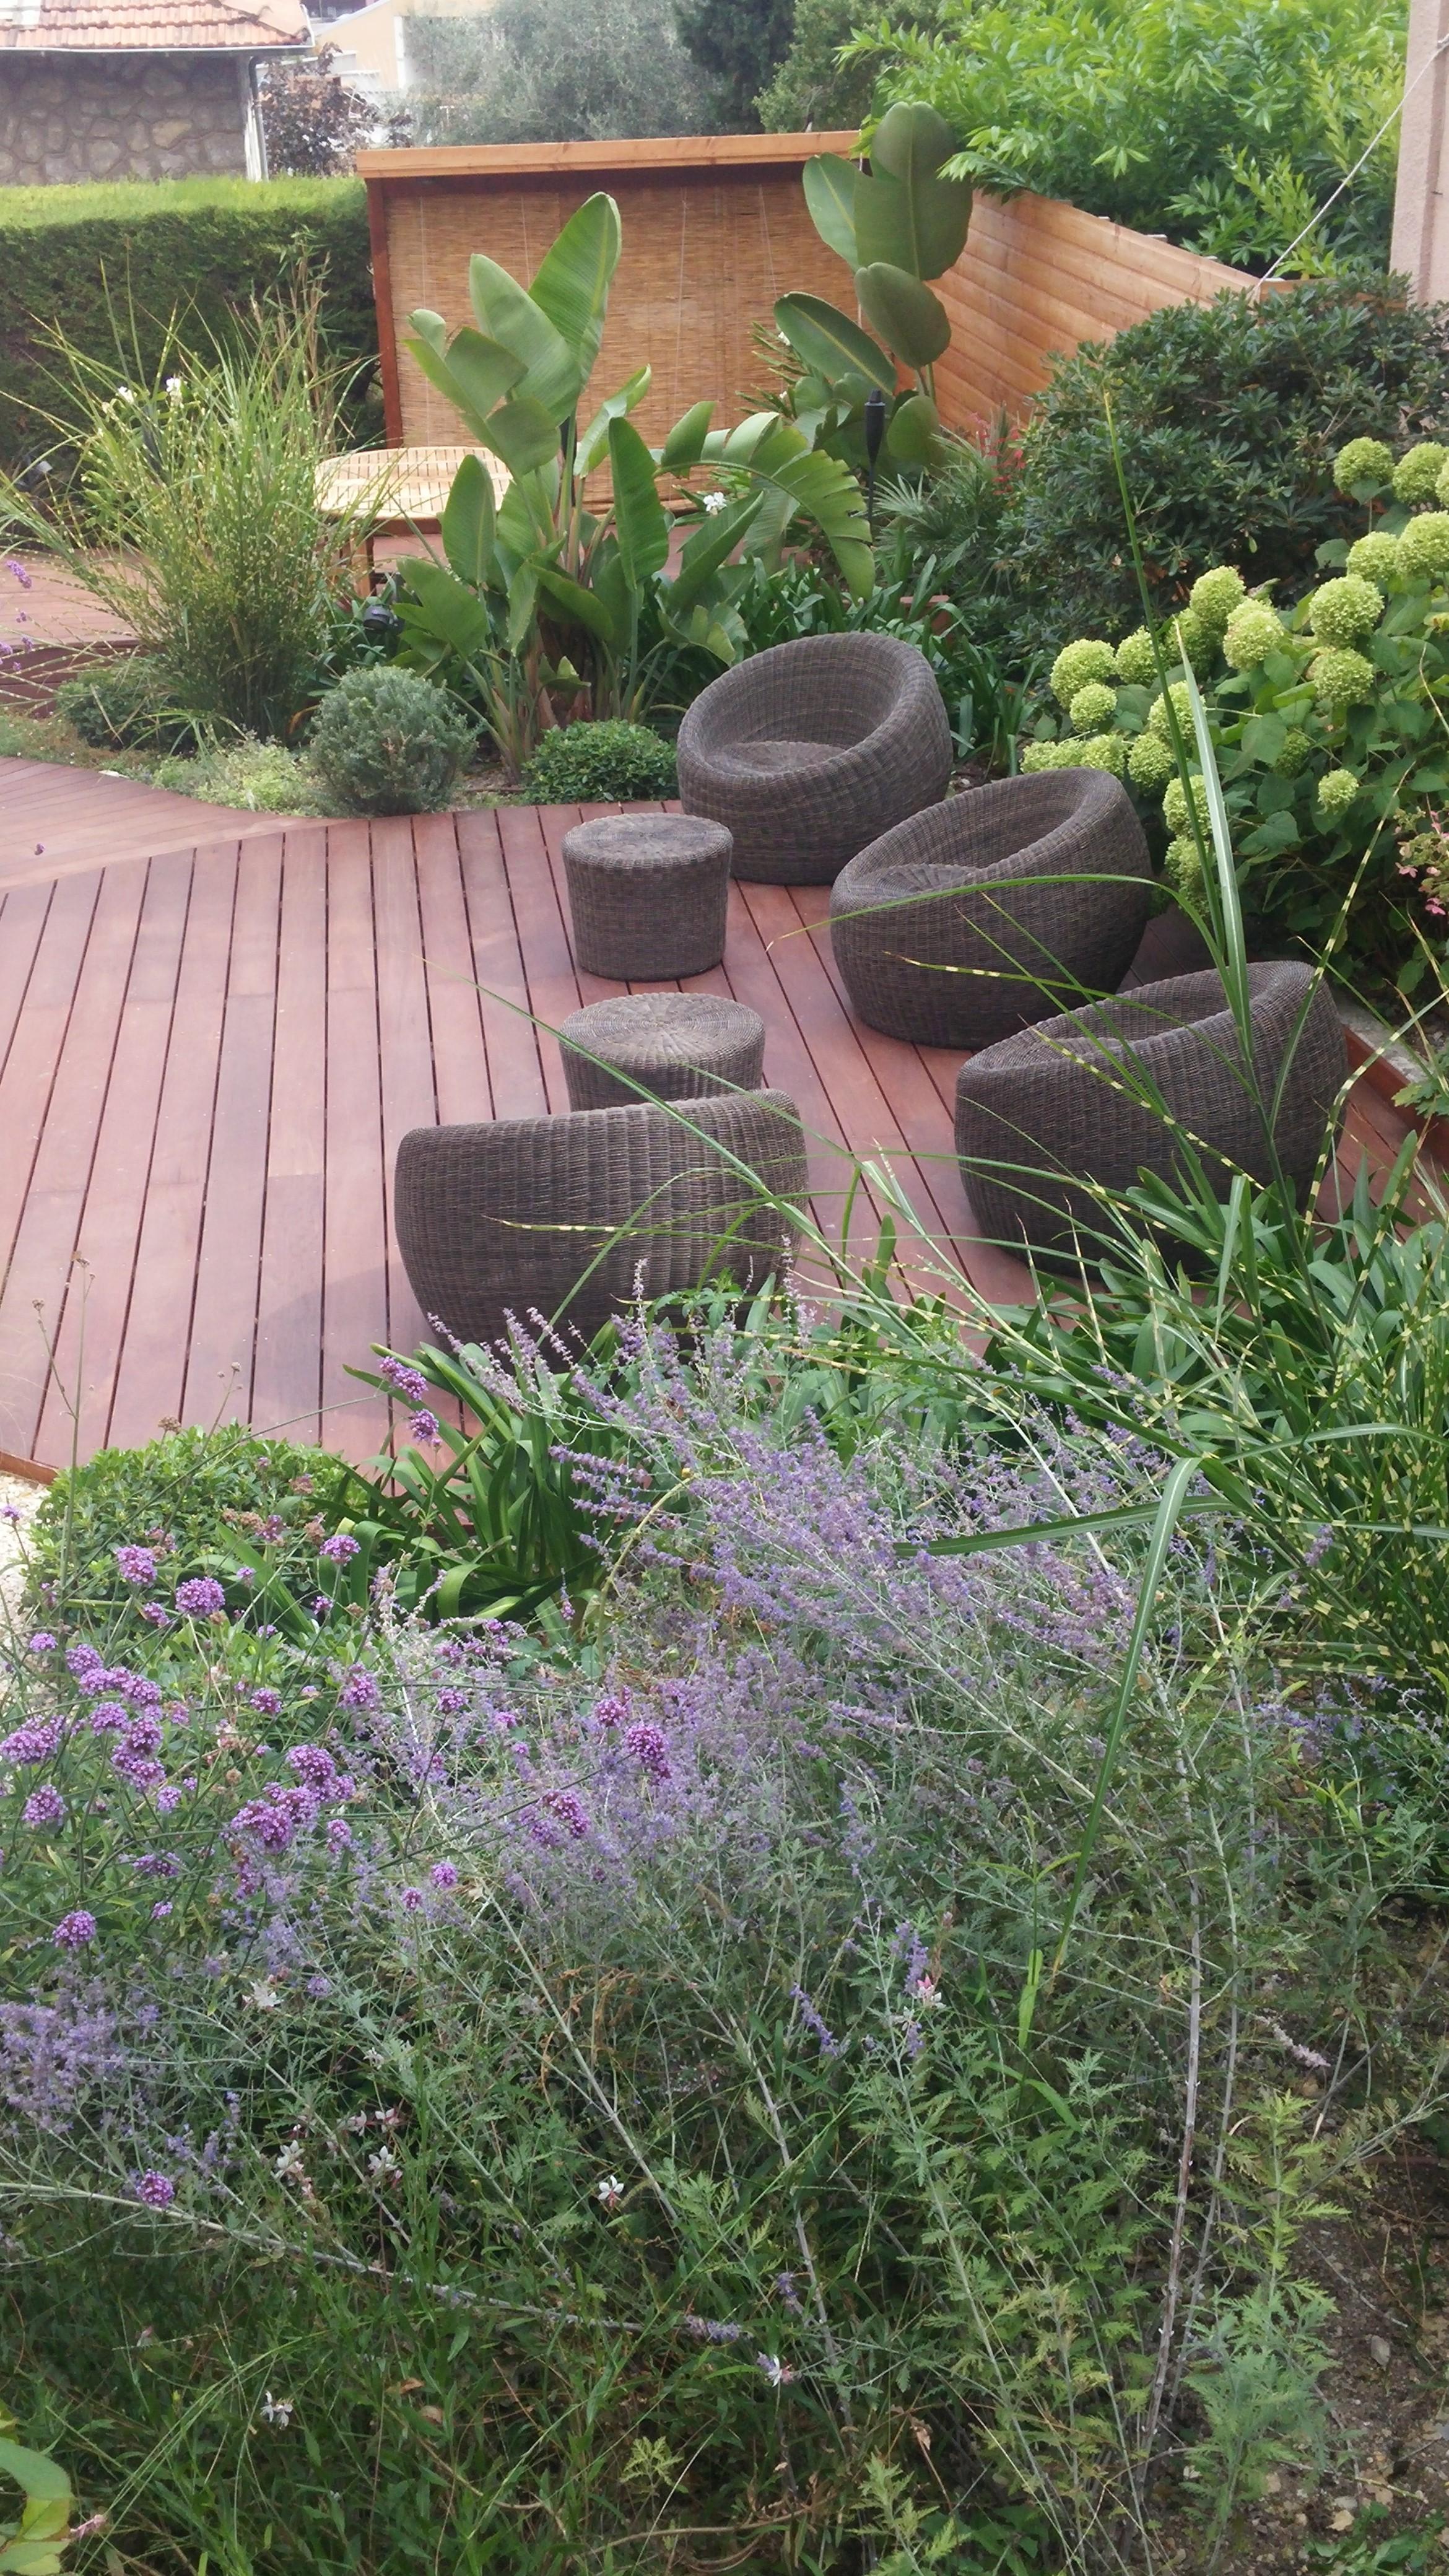 planete jardin philippe labouyrie paysagiste et cr ateur d 39 ambiancesplanete jardin. Black Bedroom Furniture Sets. Home Design Ideas